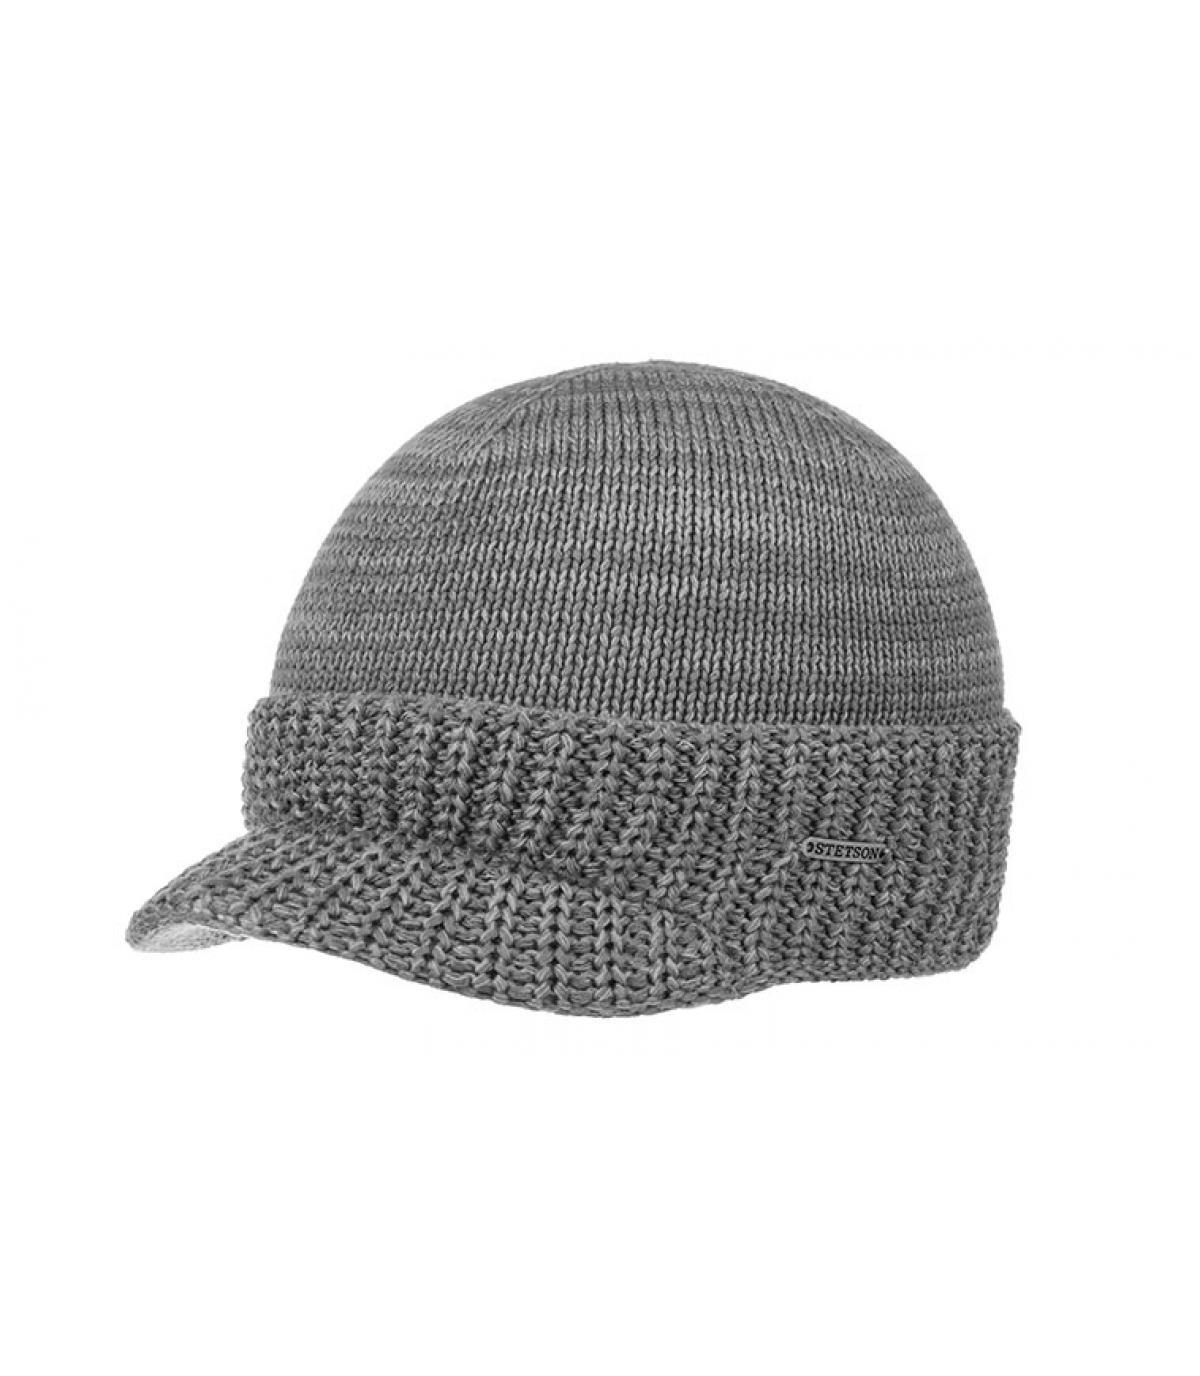 Dettagli Beanie Cooton Knit grey mix - image 2